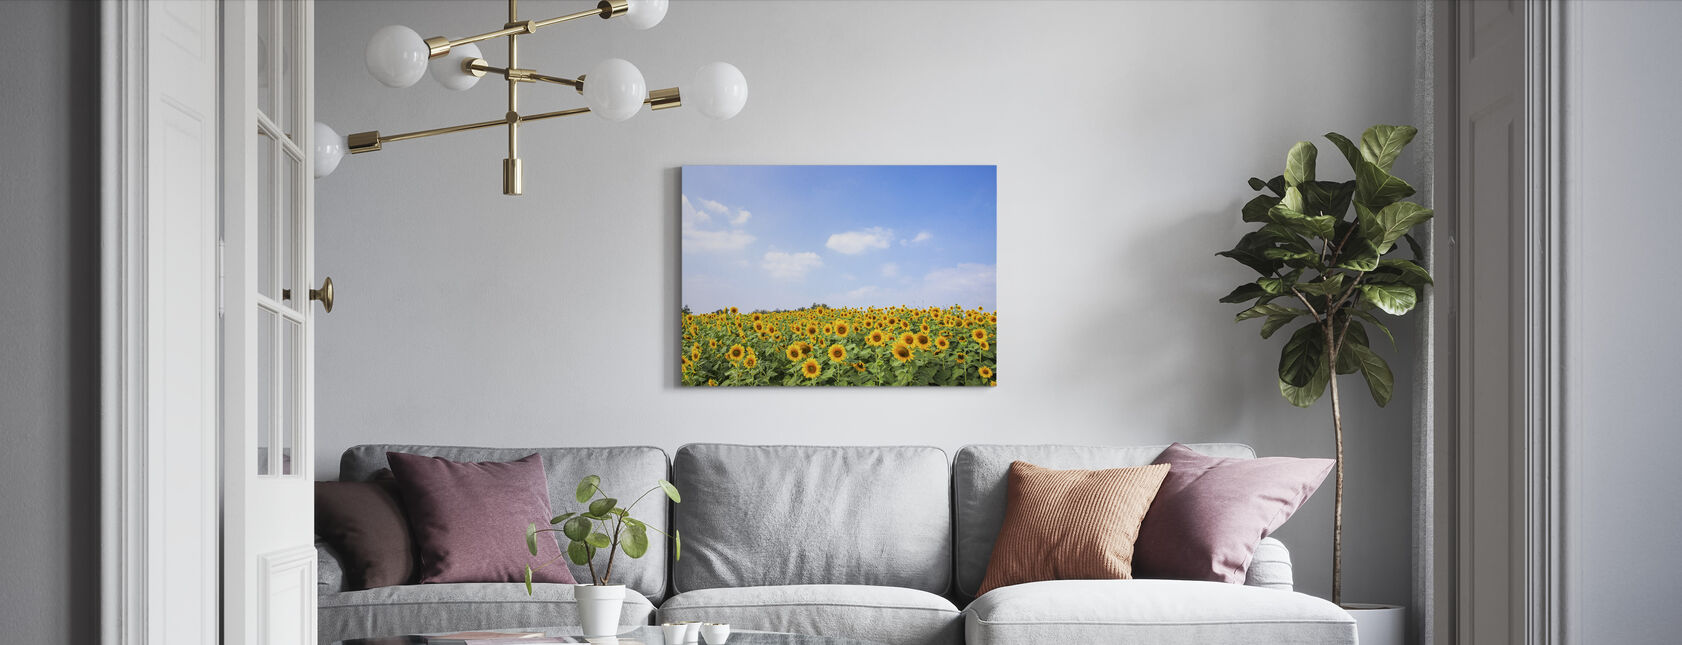 Soft Sunflowers - Canvas print - Living Room